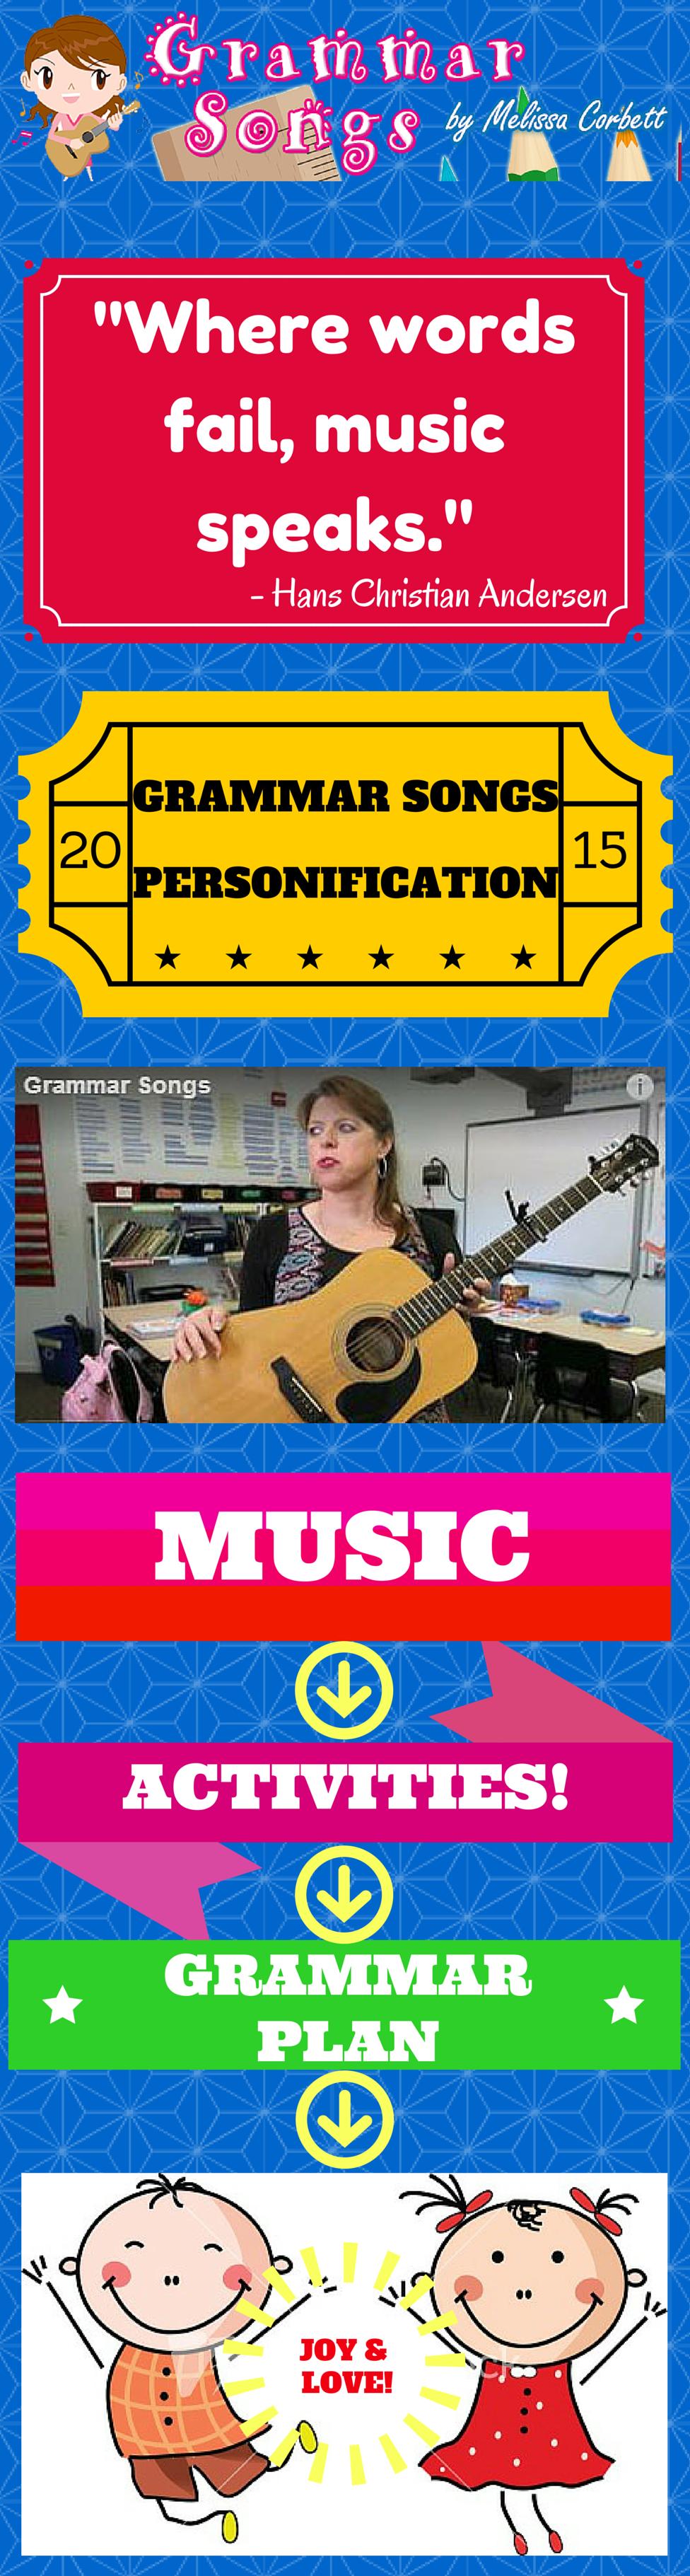 Personification Music Video Activities Grammarsongs New